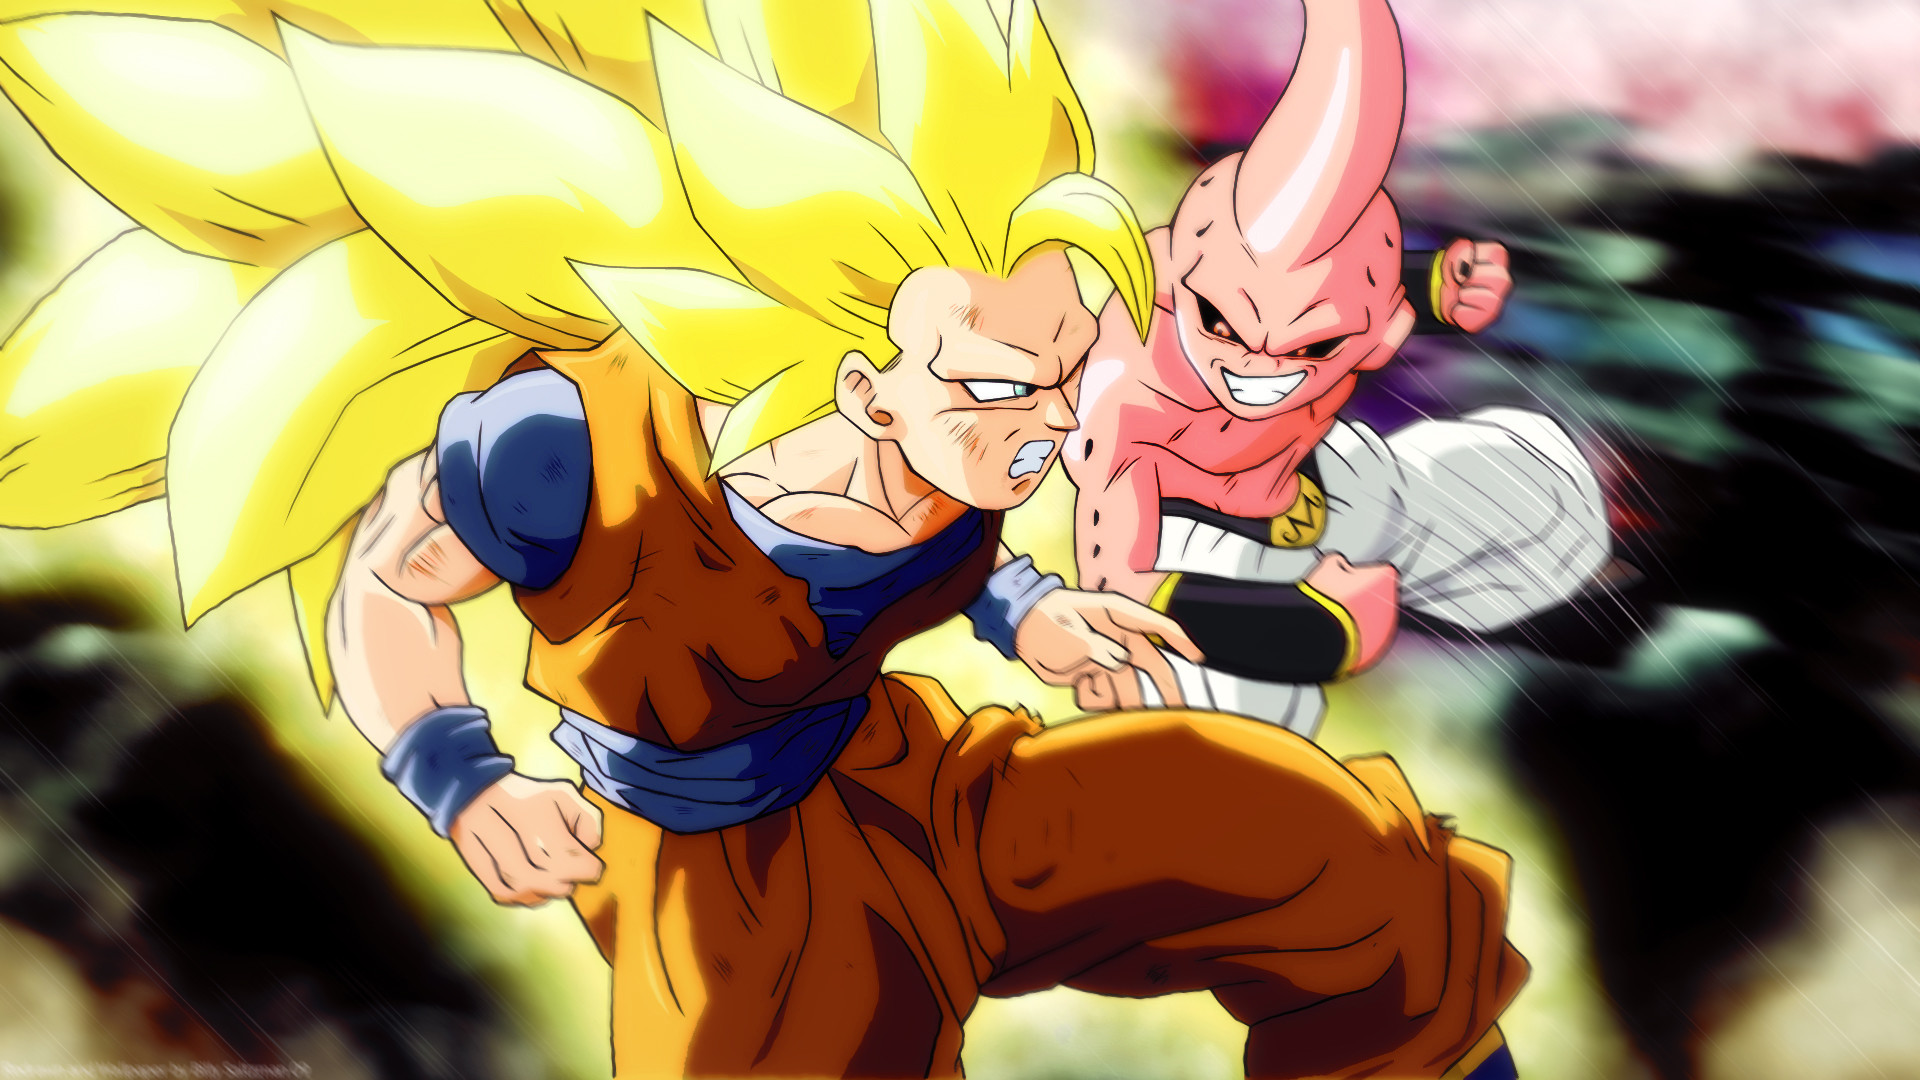 … Attachment for Dragon Ball Z Wallpaper 26 of 49 – Son Goku VS Majin Boo